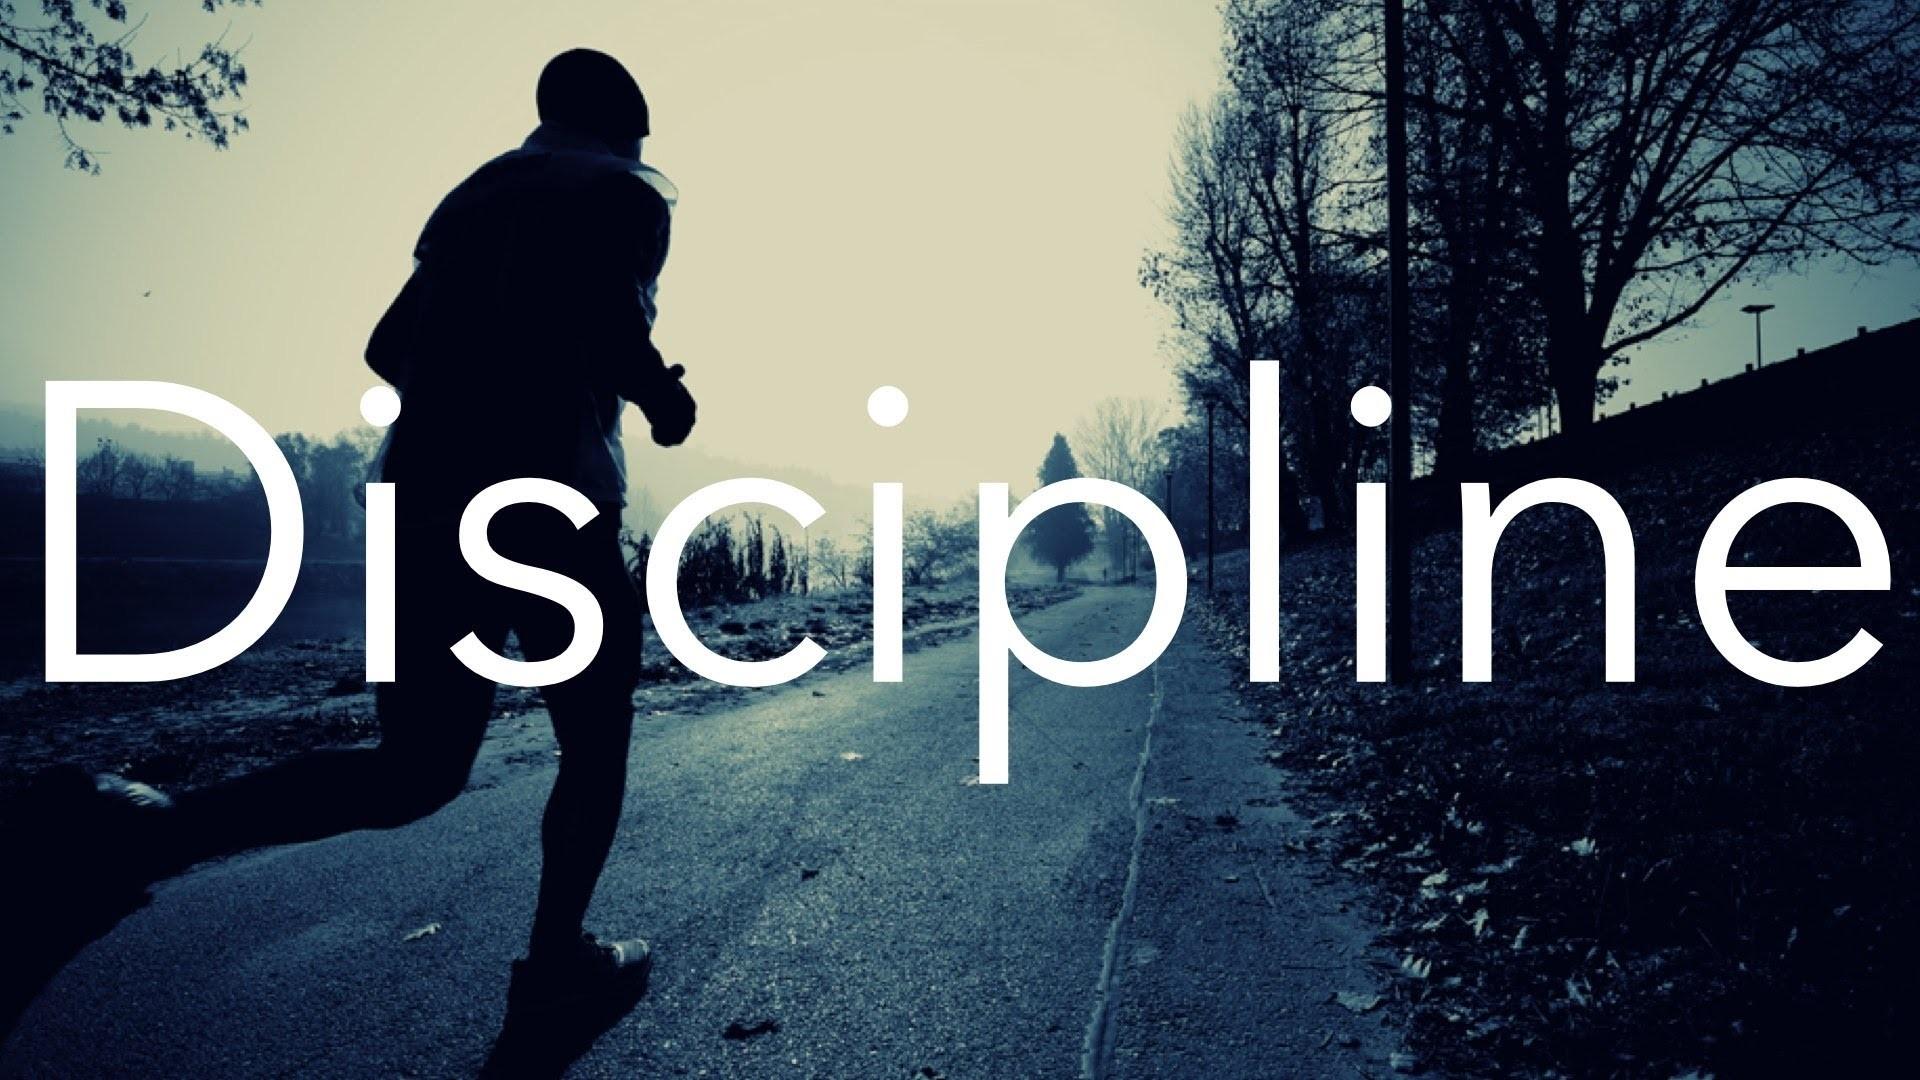 Discipline Background Wallpaper